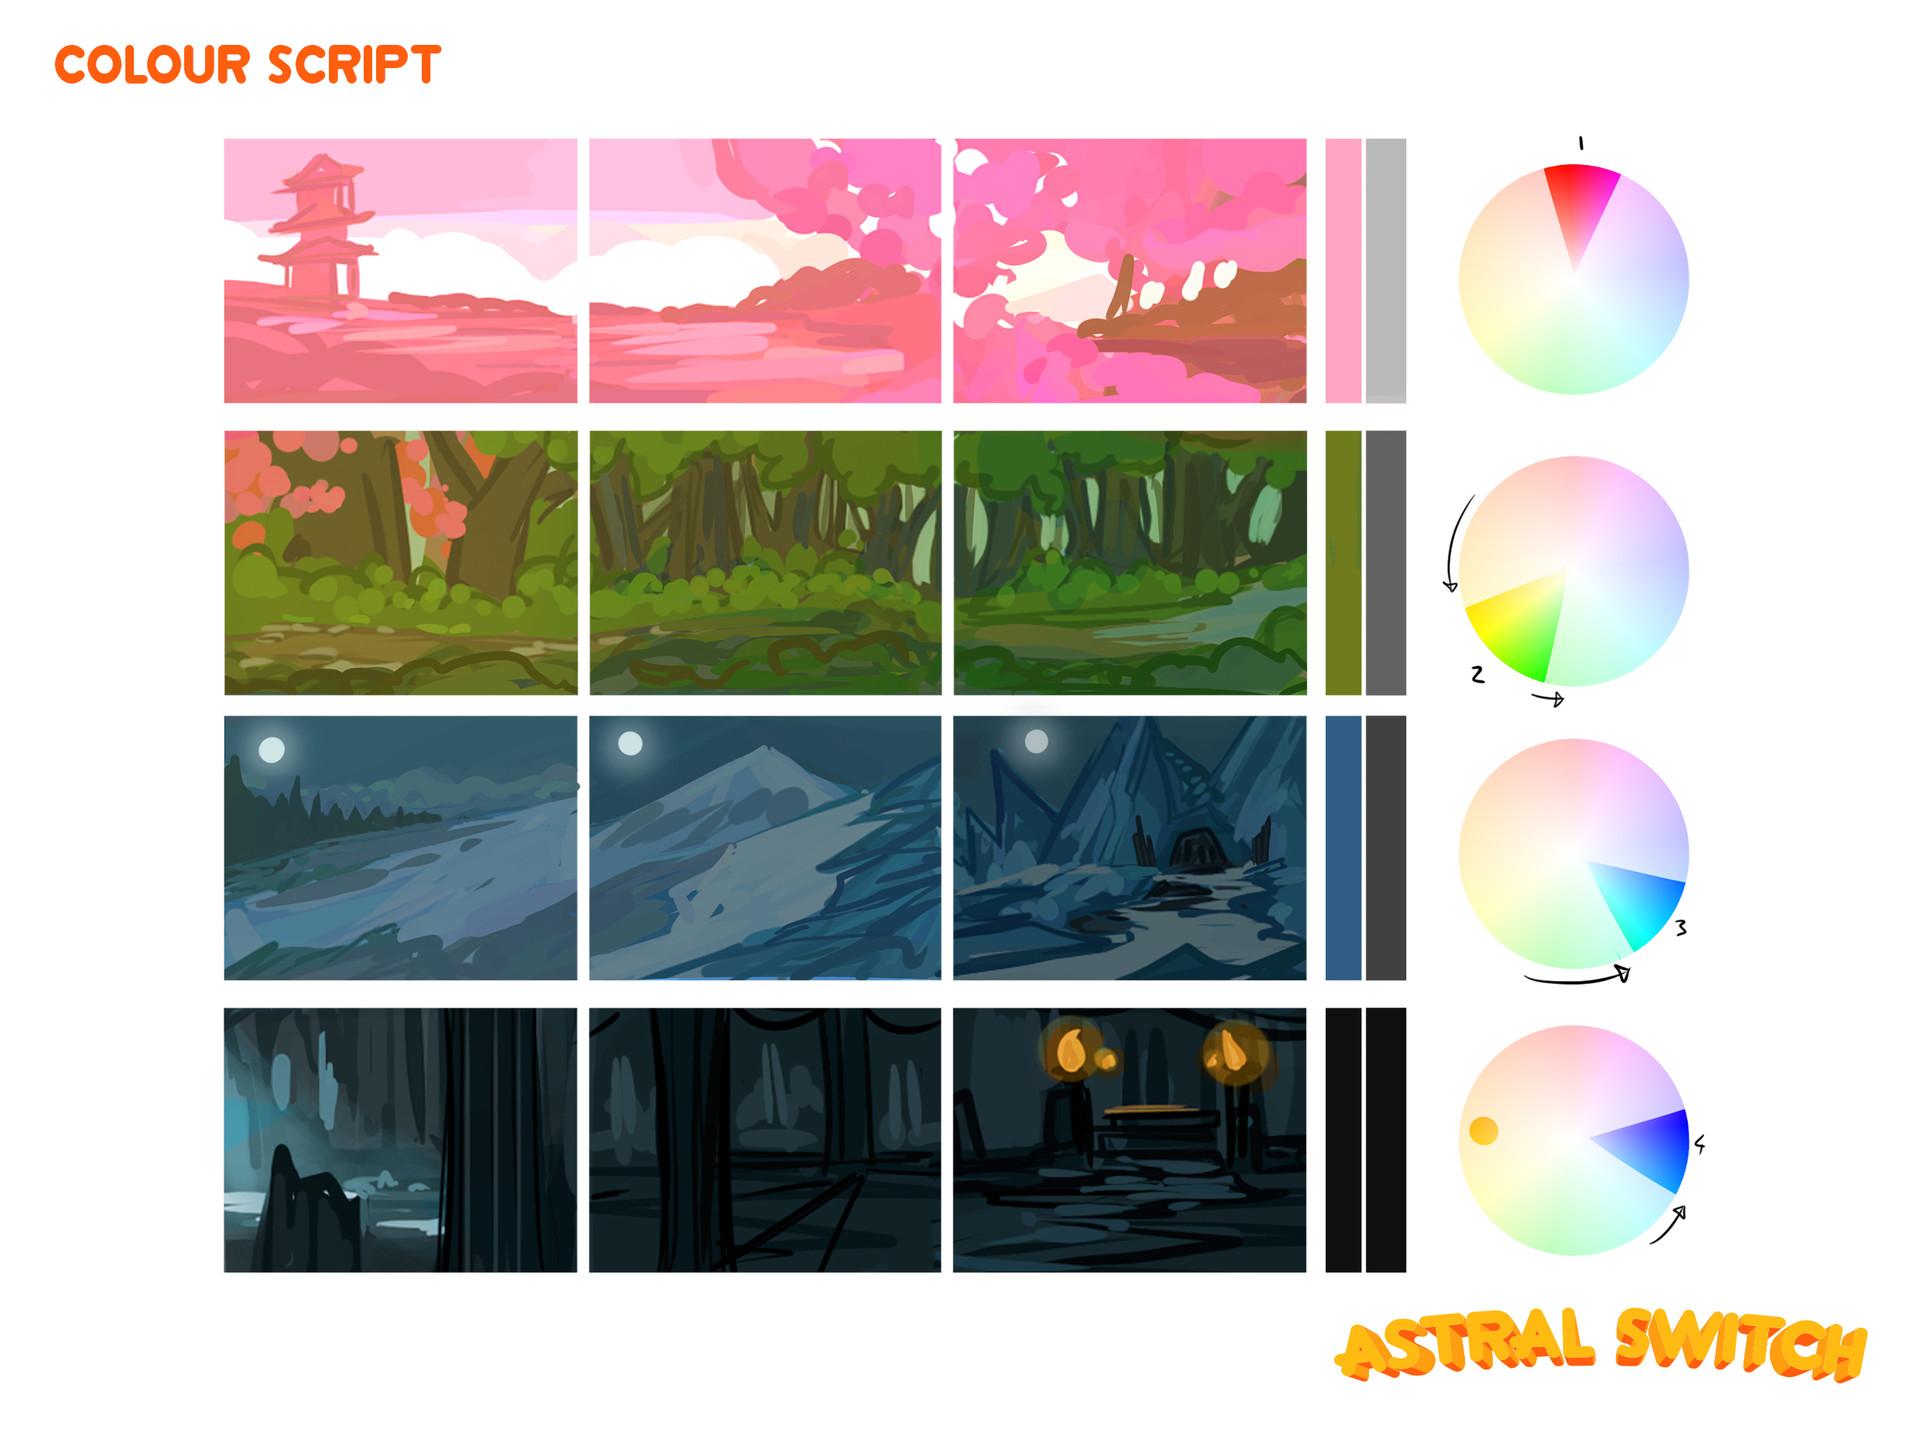 Jake bullock astralswitch03 colourscript